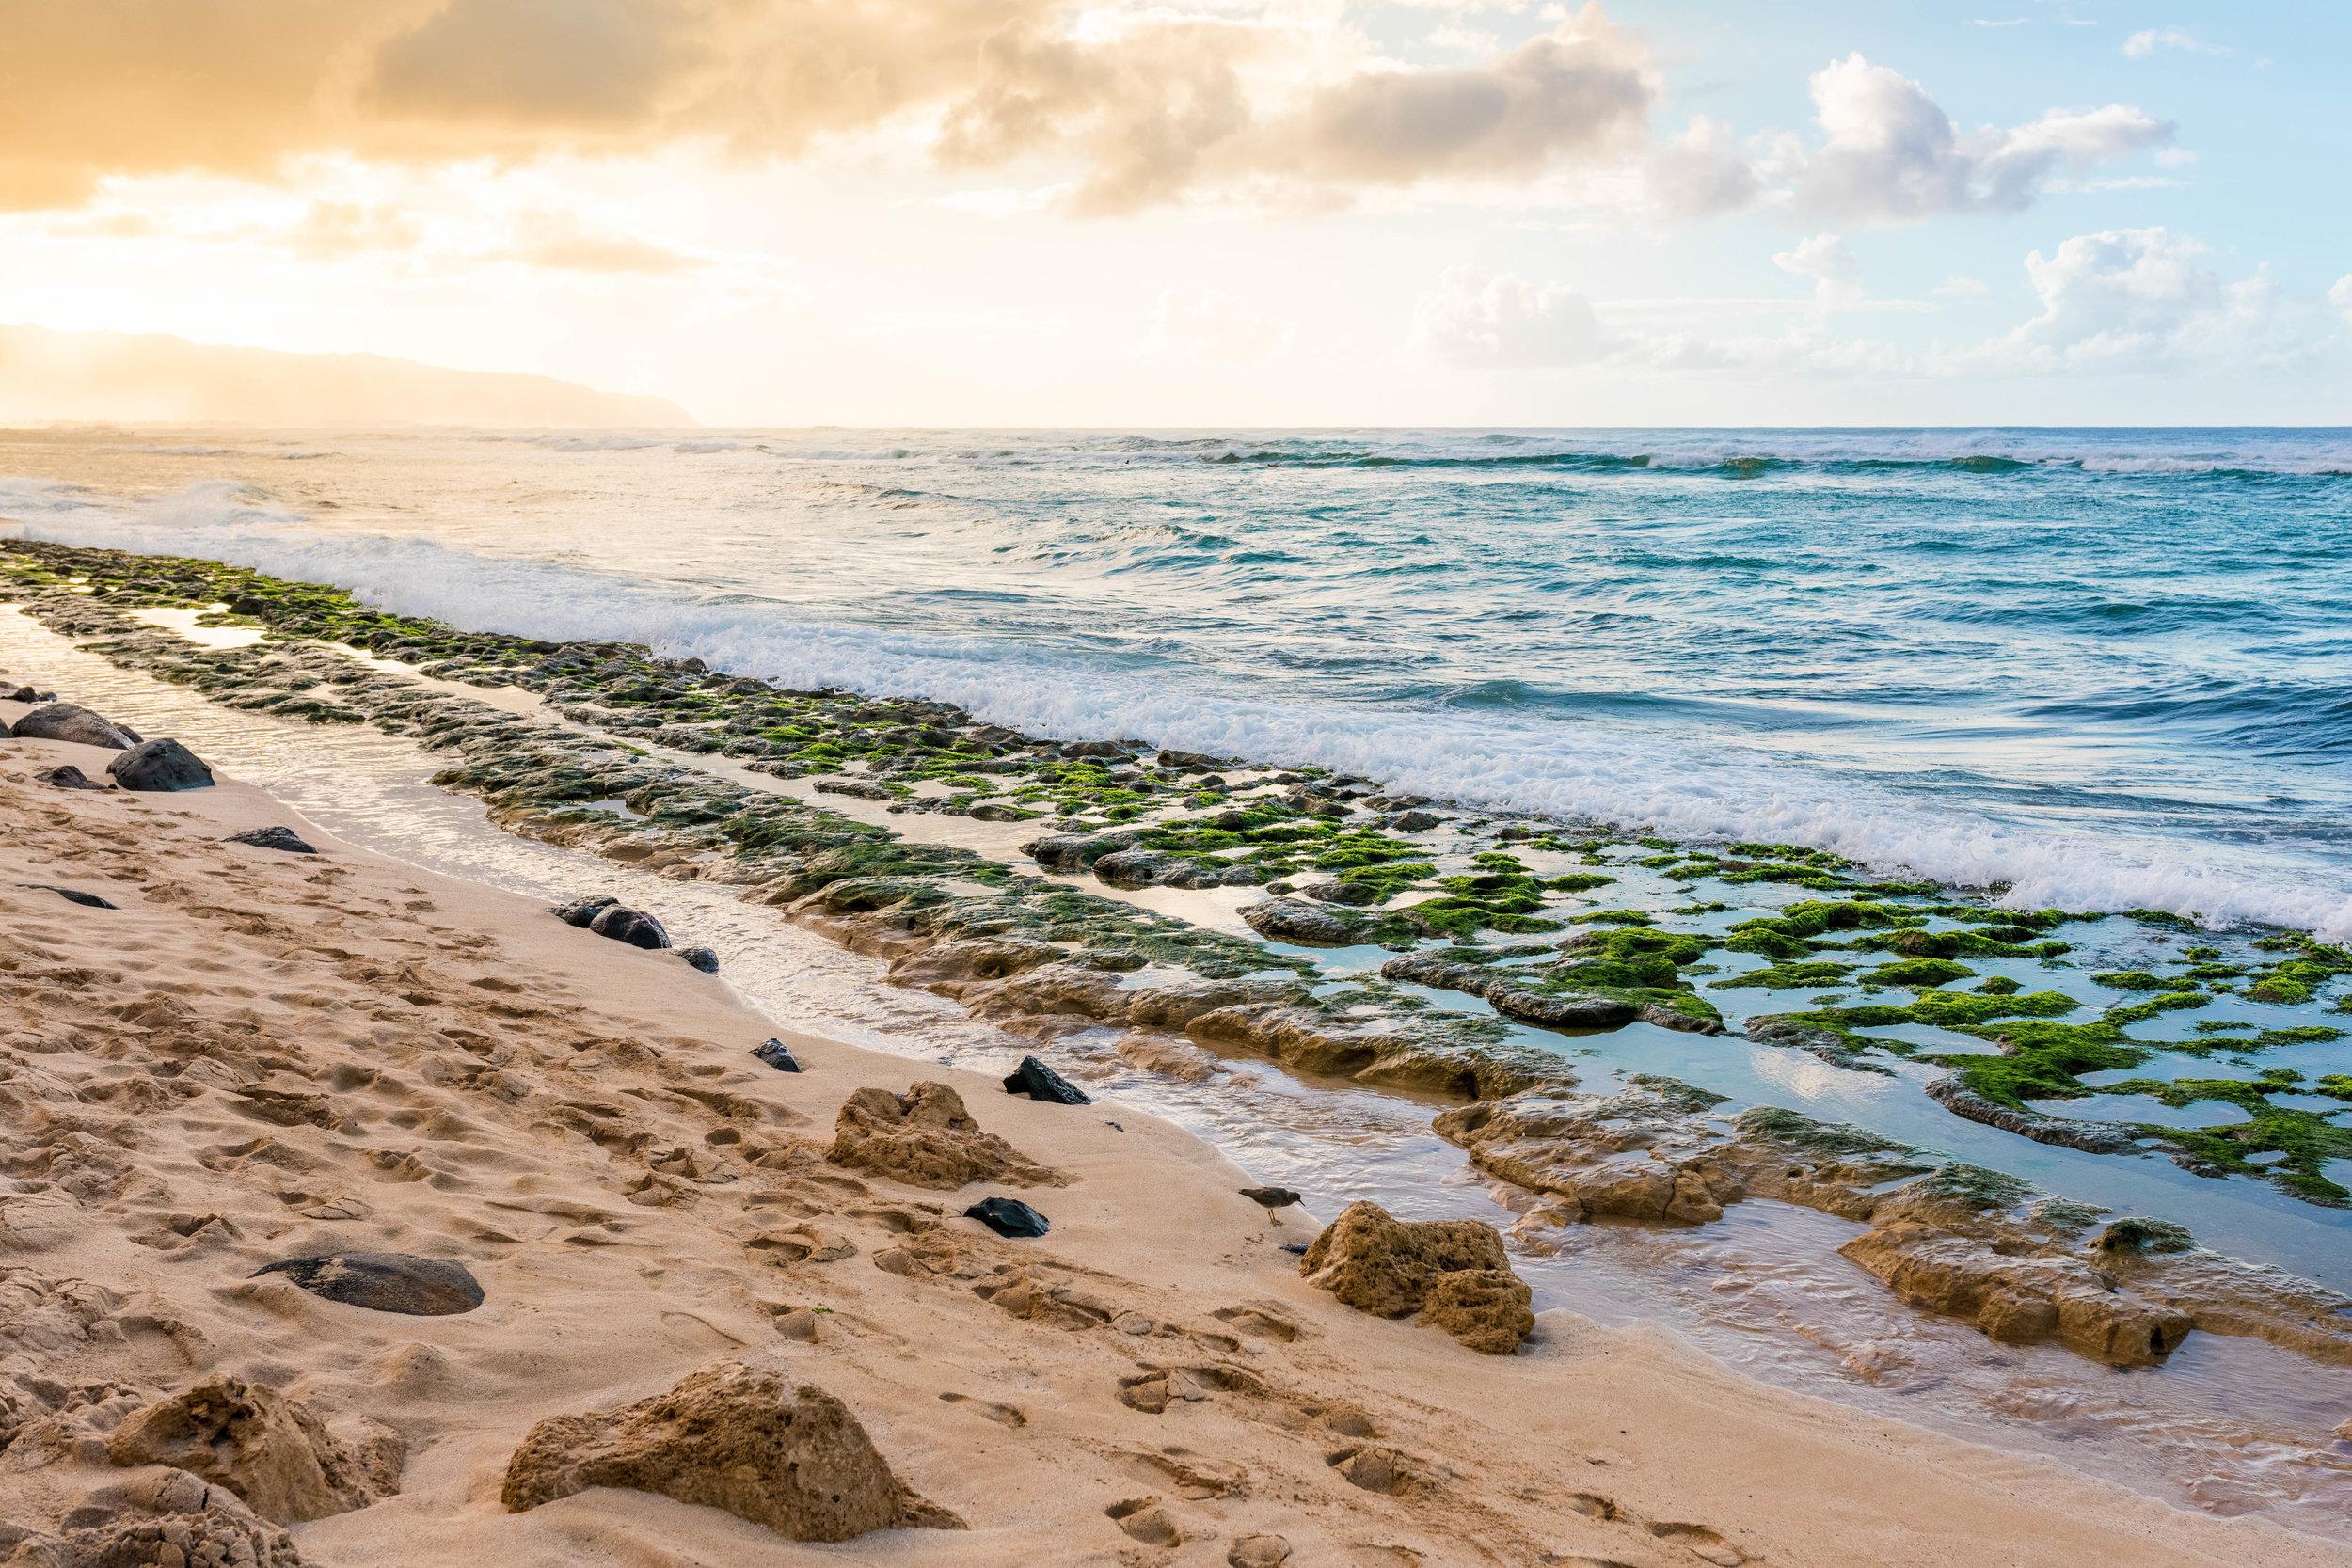 """Turtle Beach"", Laniakea Beach, North Shore, Oahu 2015"